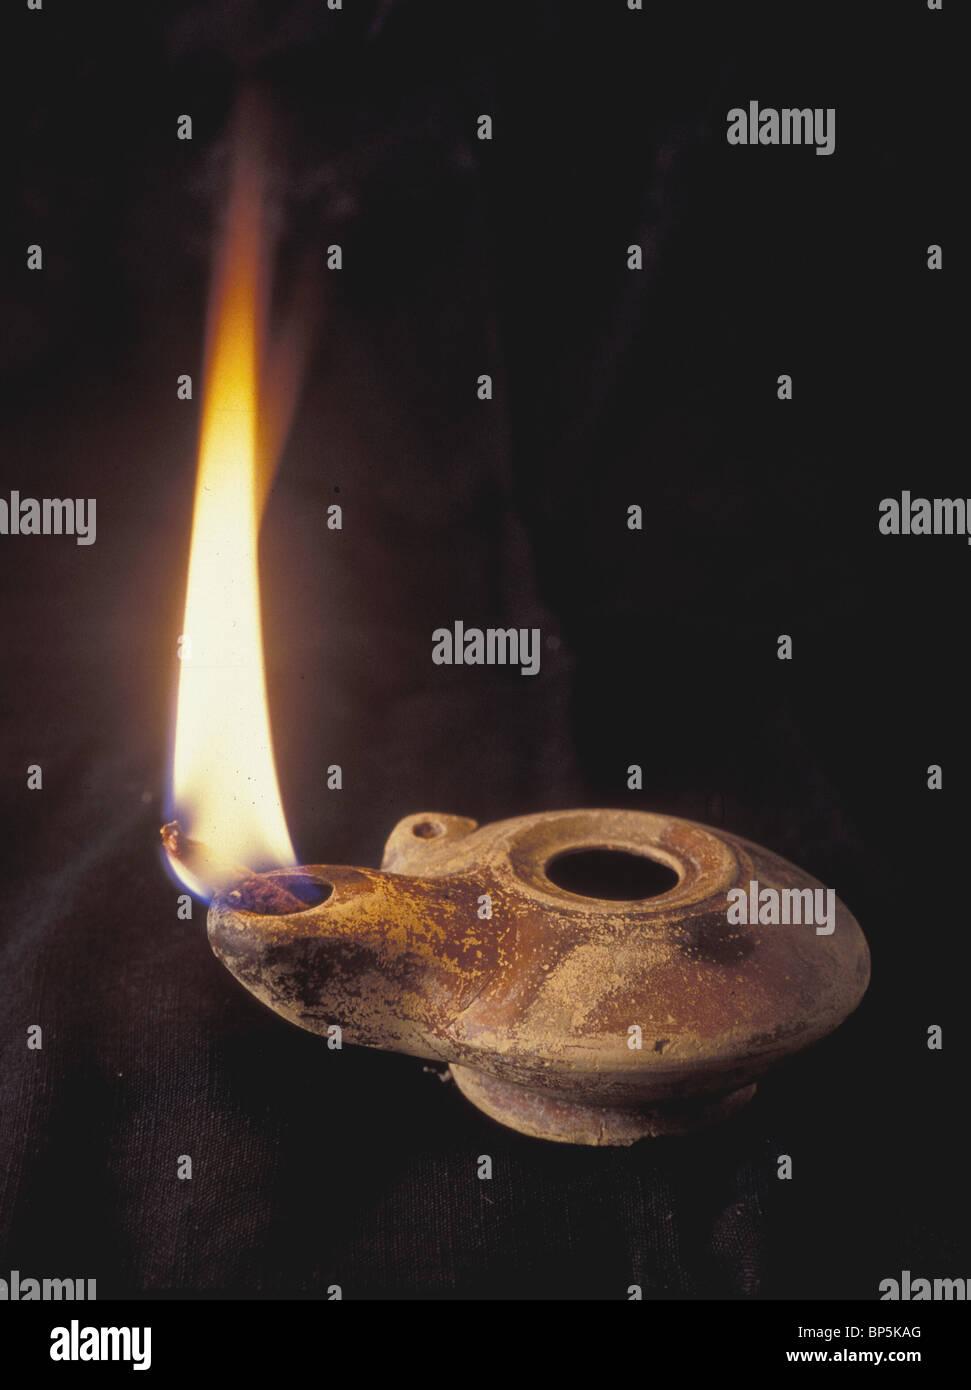 5005. Periodo HELENISTIC olio lampada Immagini Stock